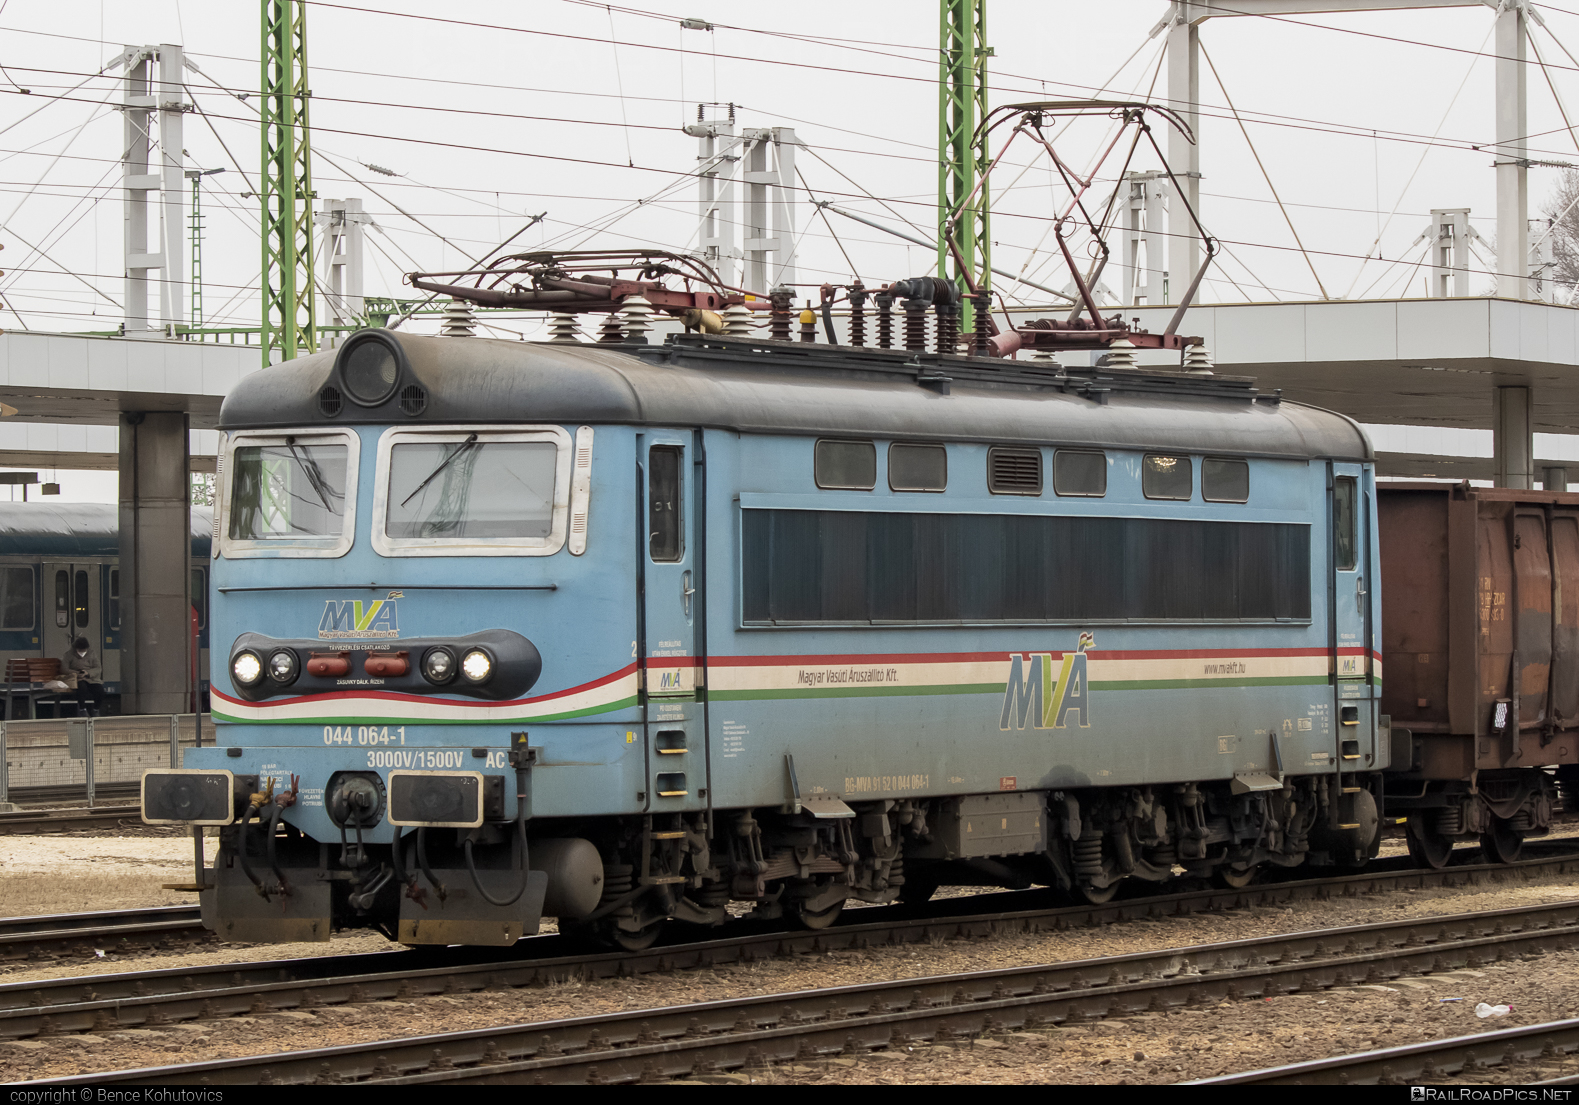 Škoda 73E - 044 064-1 operated by Magyar Vasúti Árúszállító Kft. #locomotive242 #magyarvasutiaruszallito #plechac #skoda #skoda73e